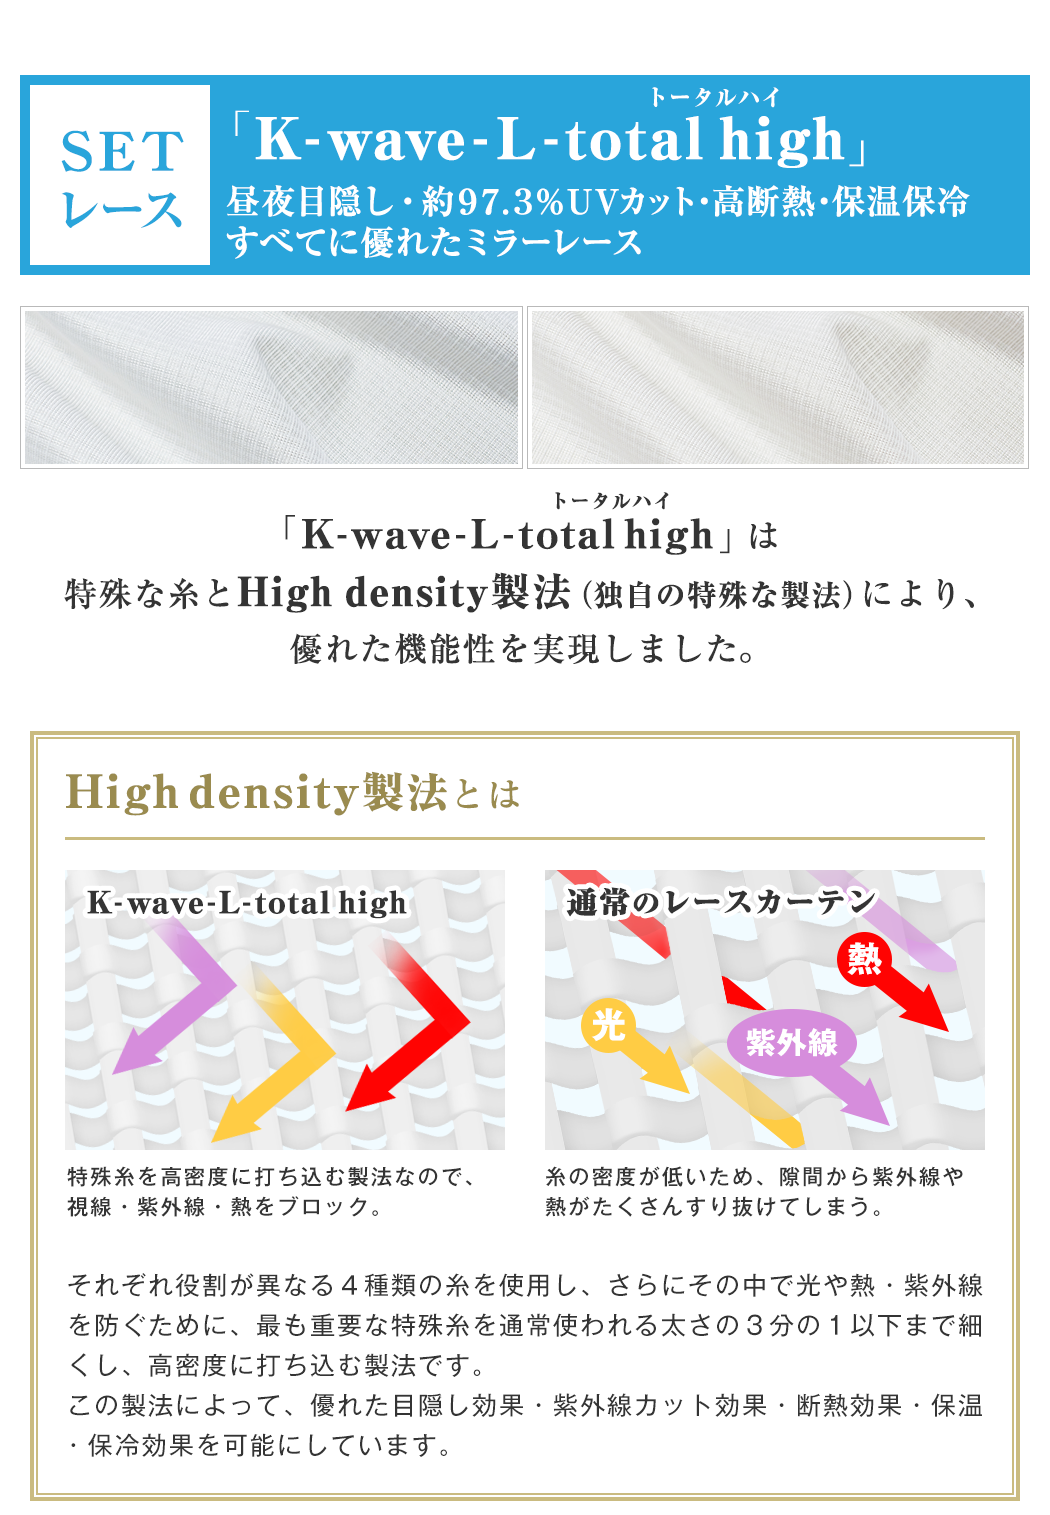 K-wave-L-total high 昼夜目隠し・紫外線カット・高断熱とすべてに優れたレースカーテン